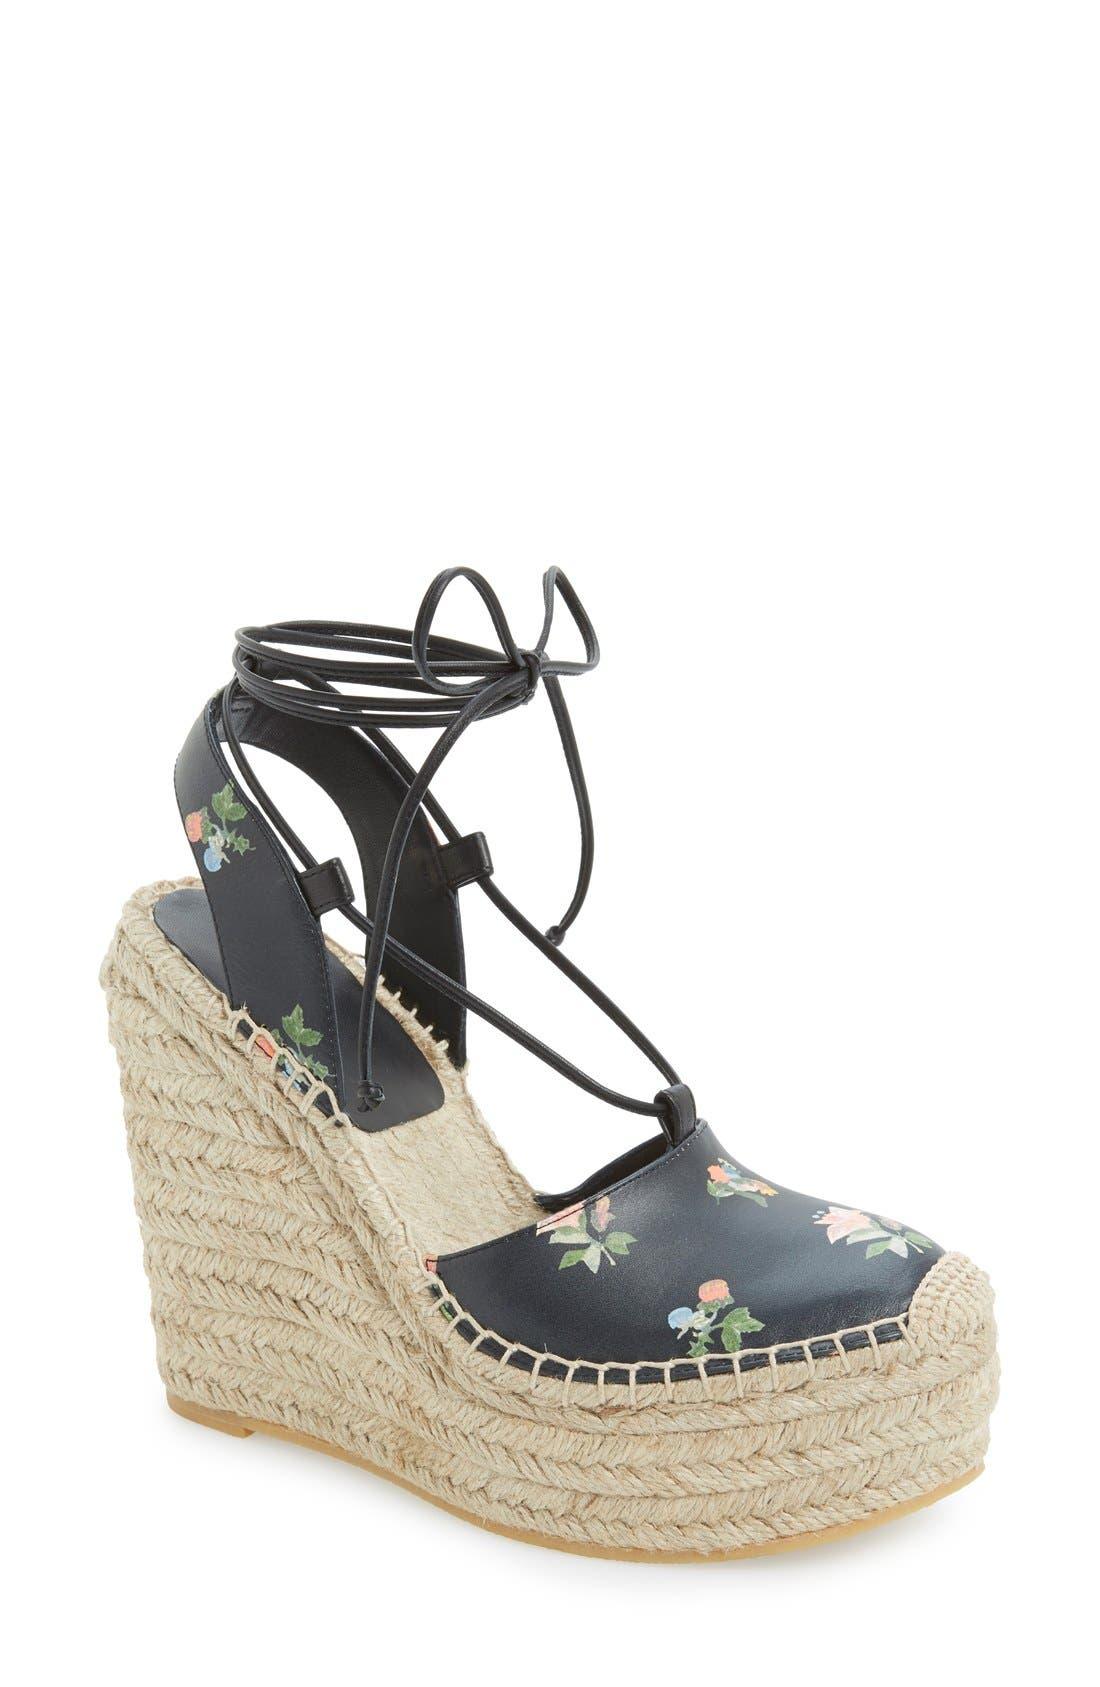 Main Image - Saint Laurent Espadrille Wedge Sandal (Women)